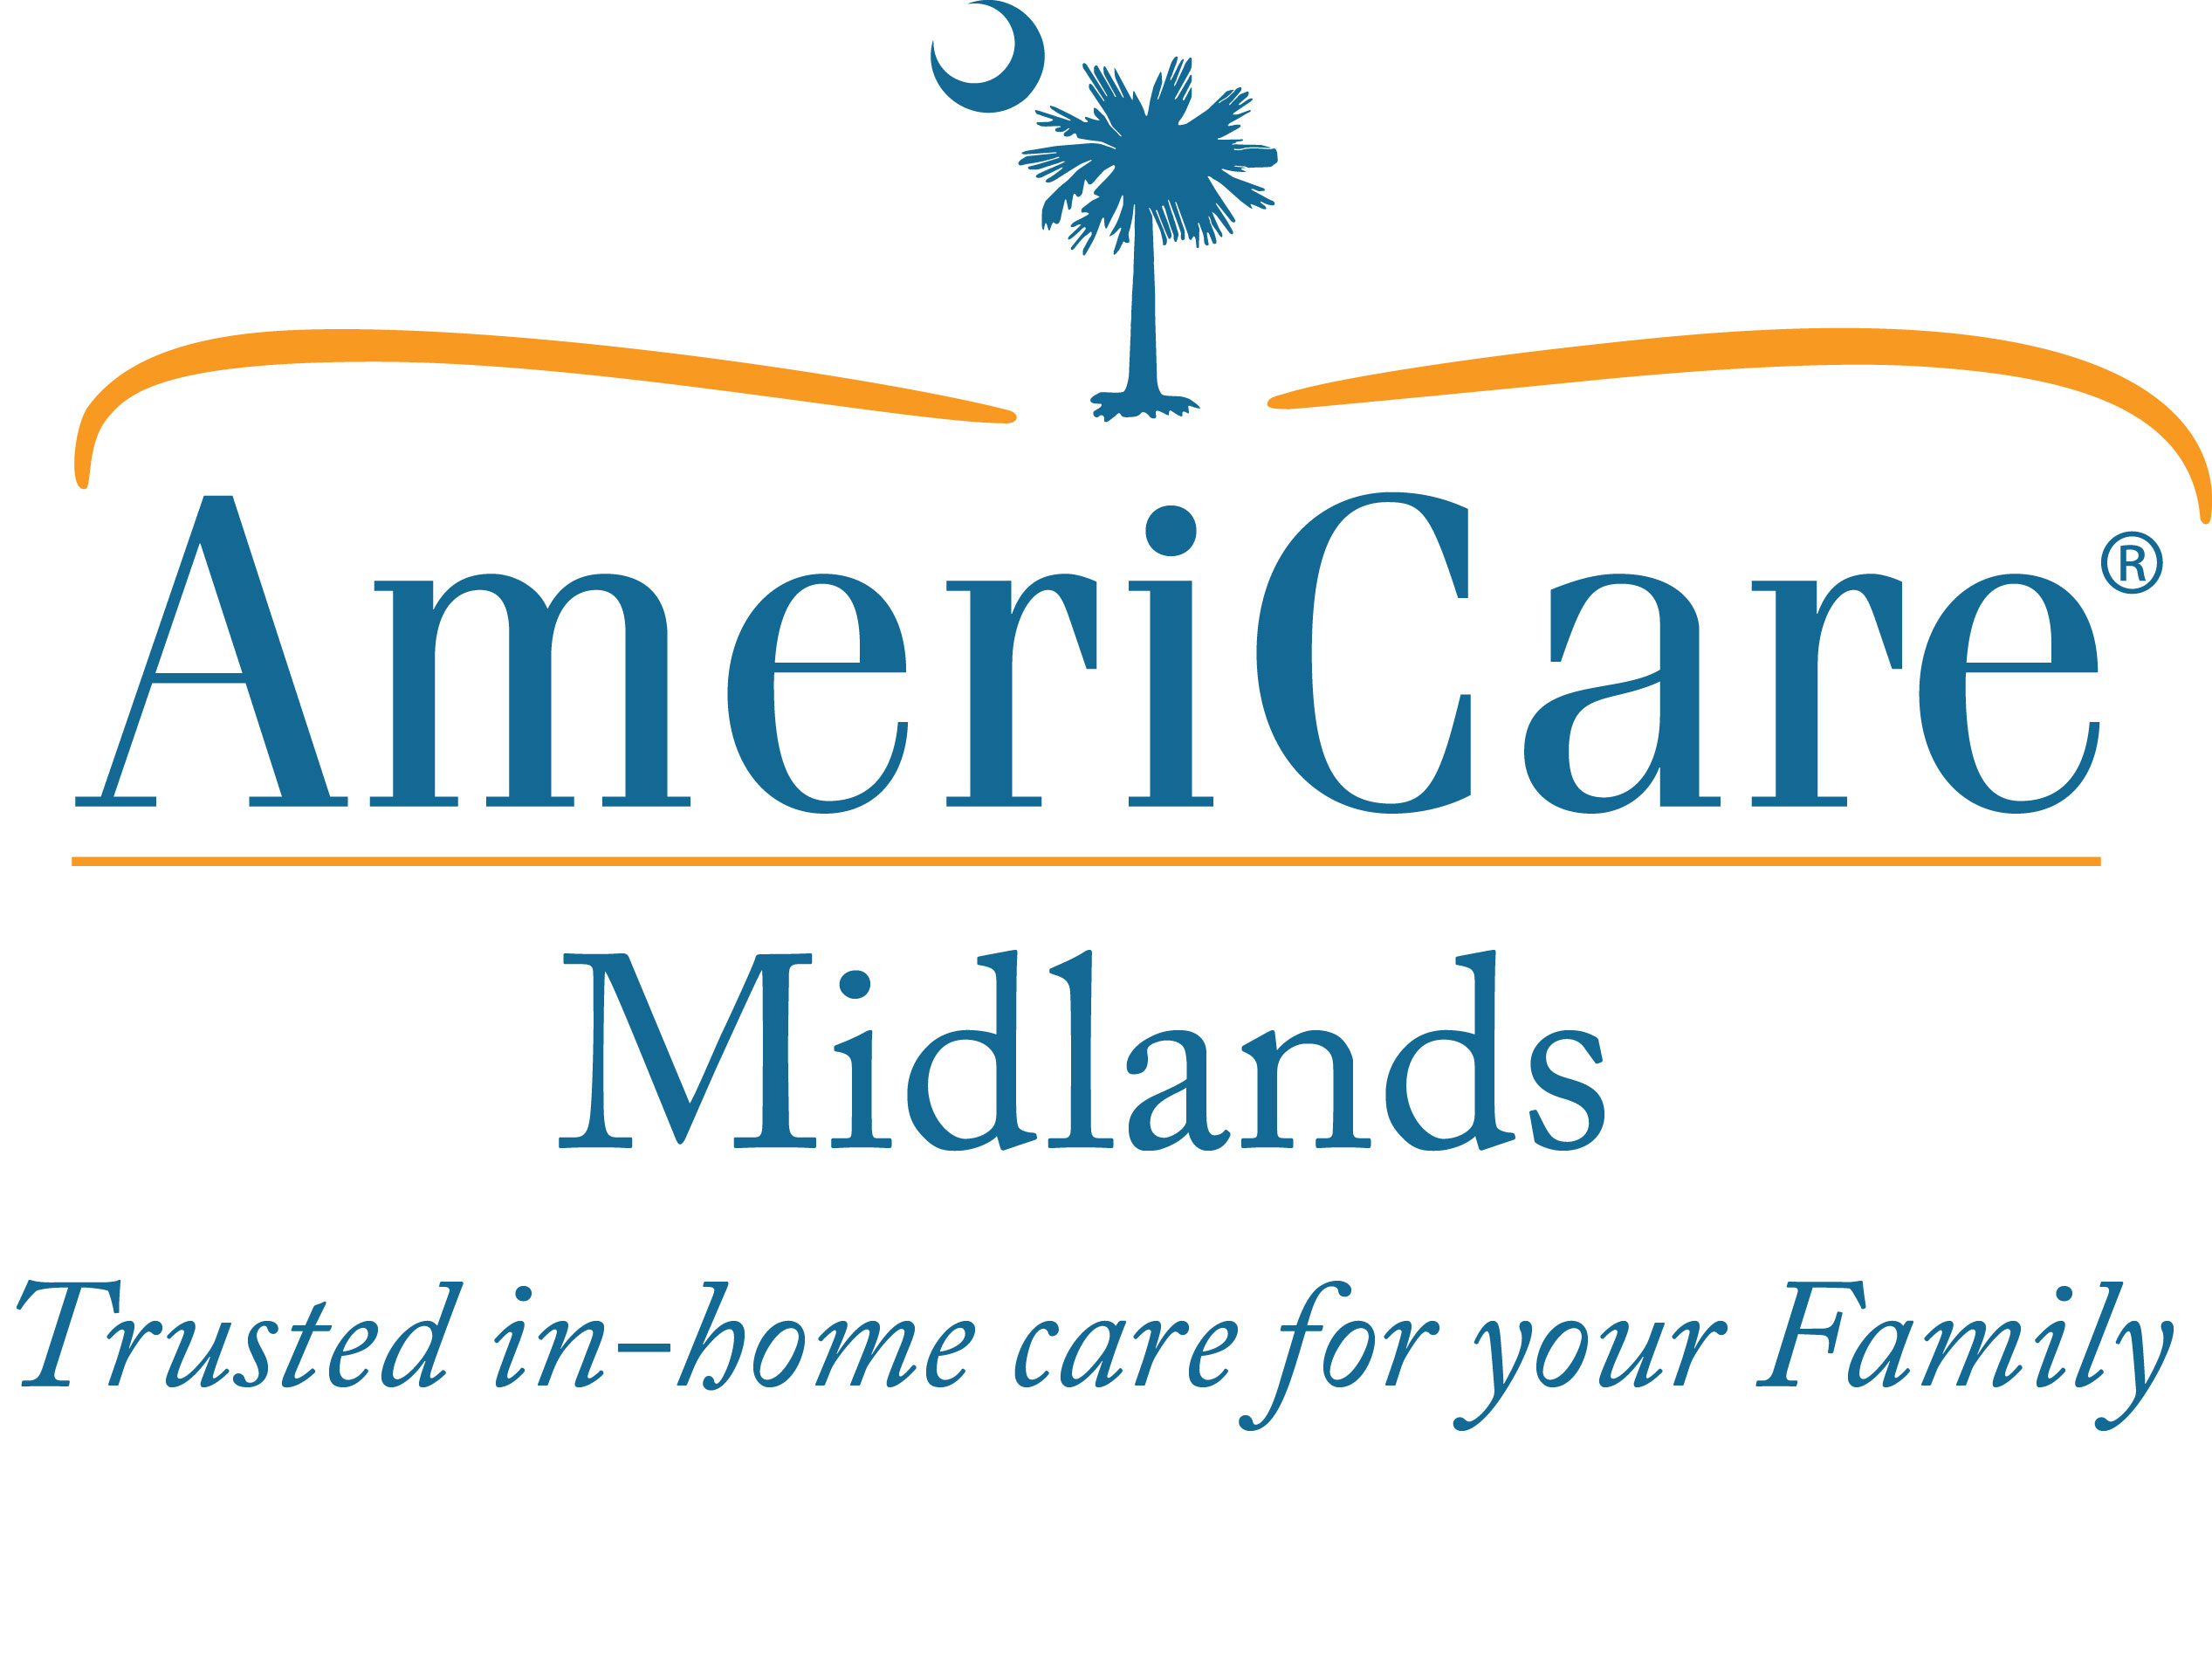 AmeriCare Midlands